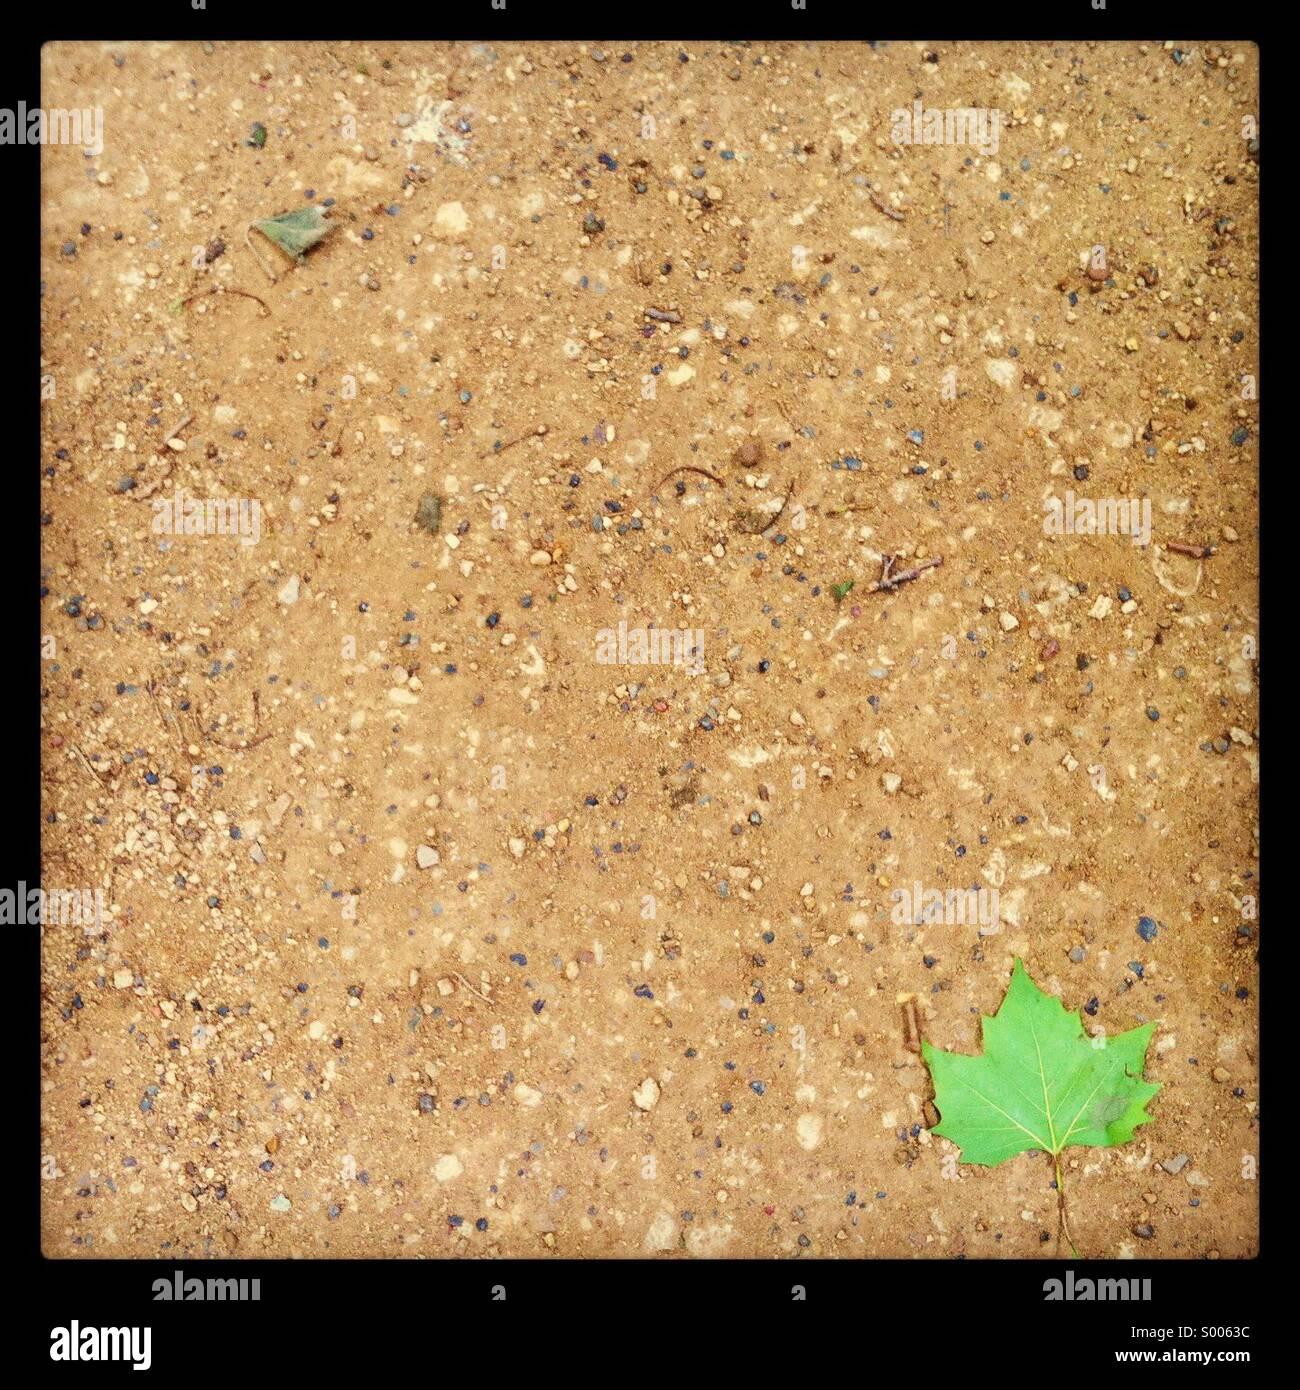 Green leaf on a sandy floor - Stock Image